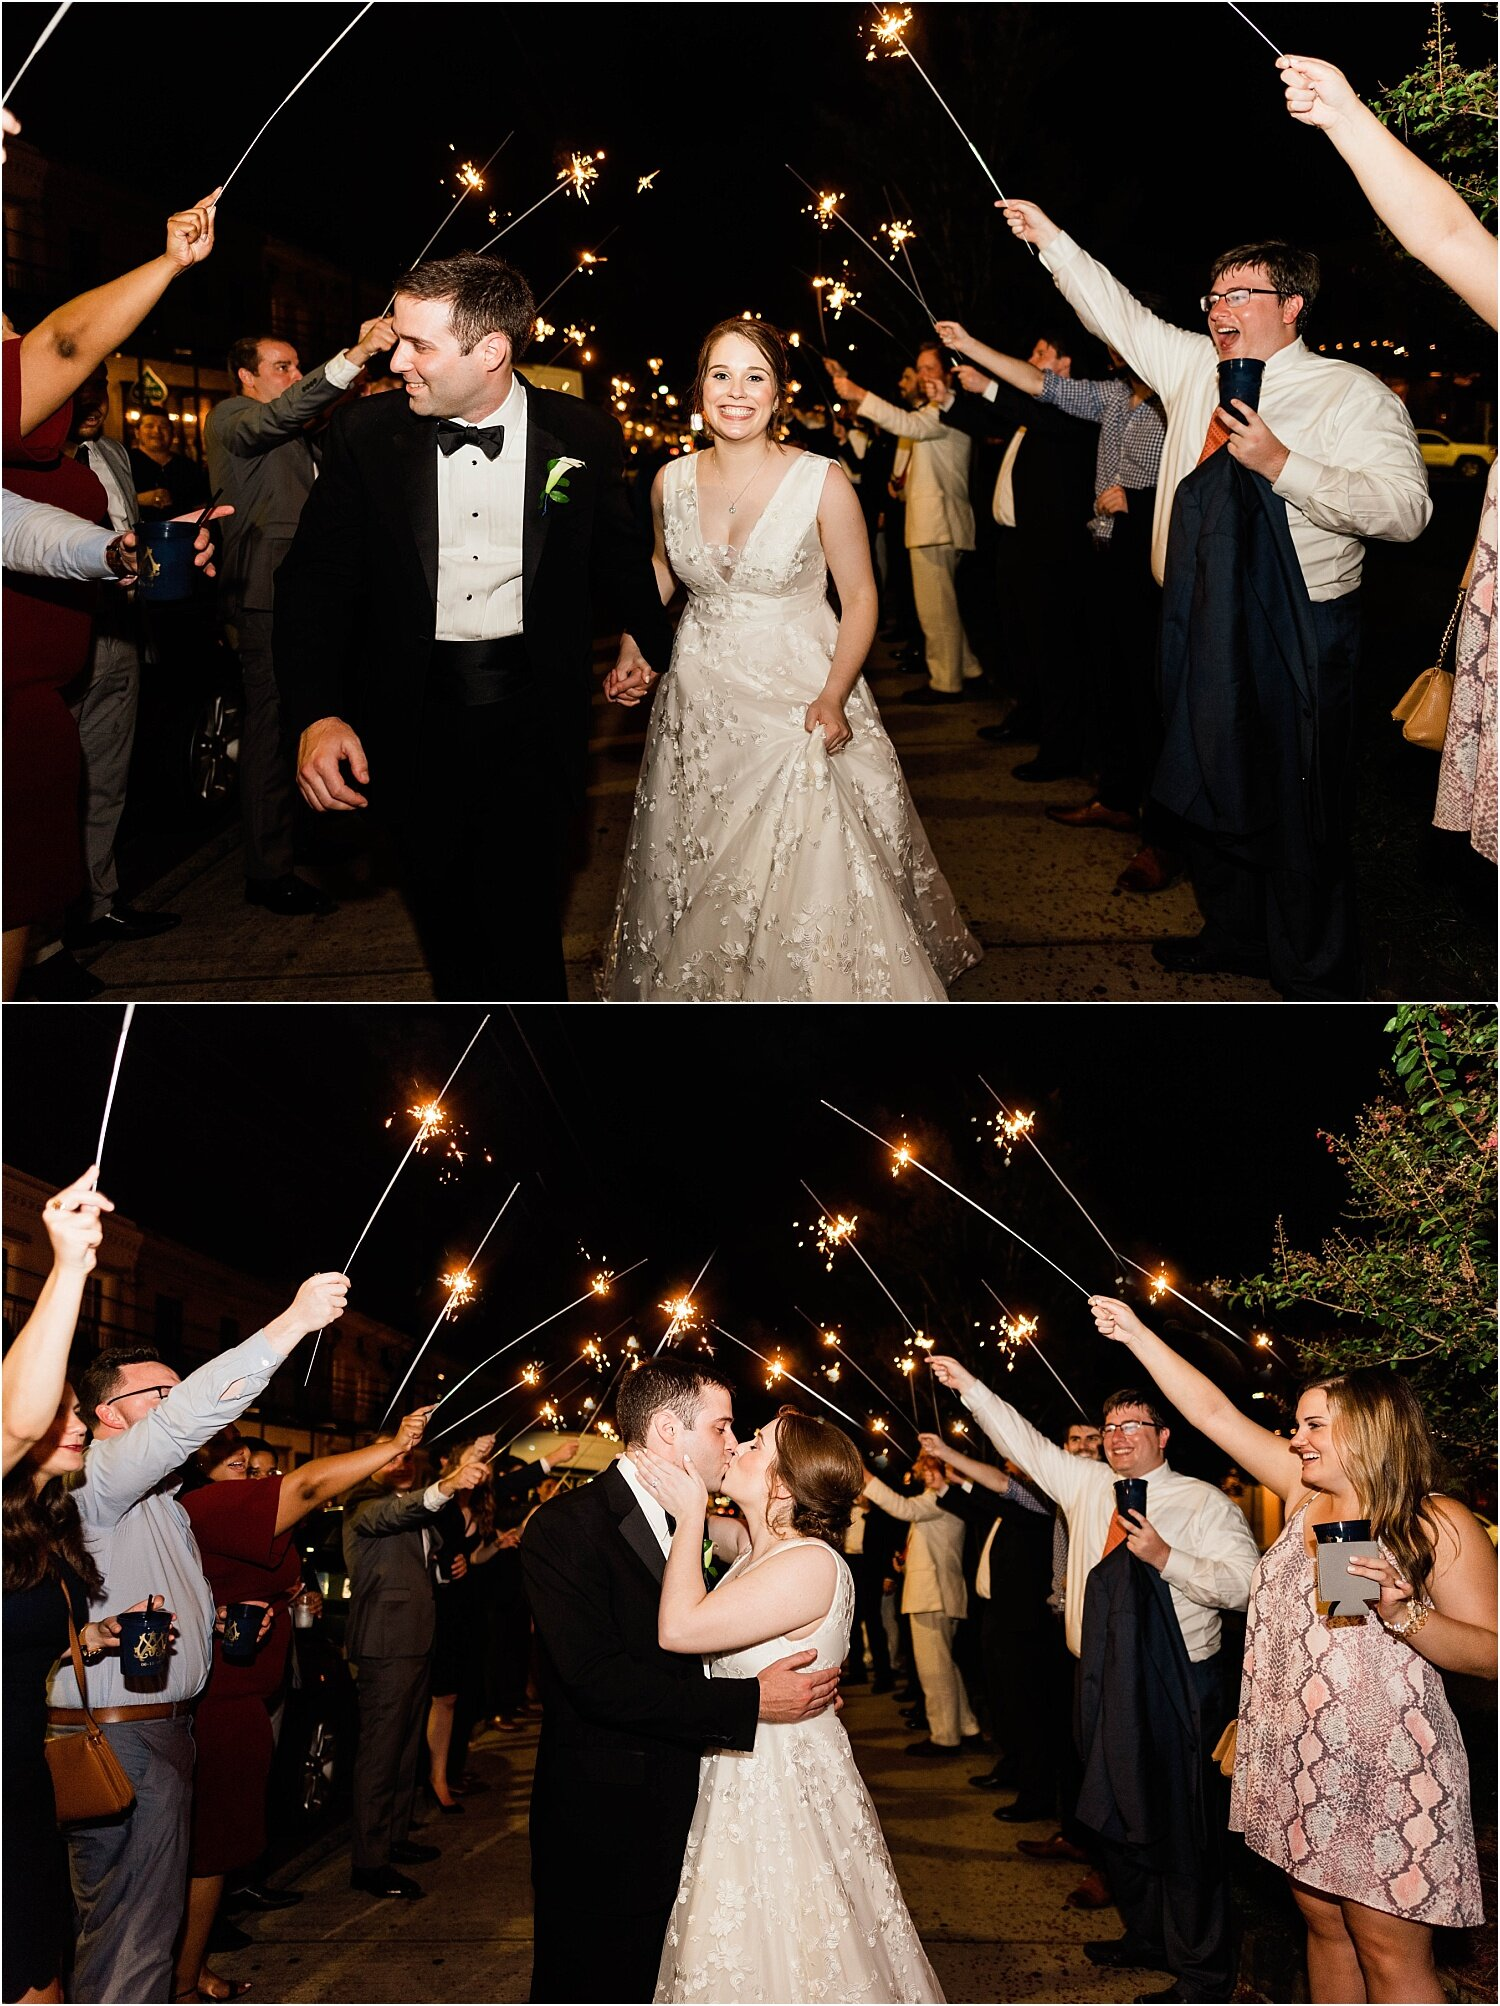 Maitland + Alex-Il-Mercato-New-Orleans-Wedding_Gabby Chapin Photography_052.jpg